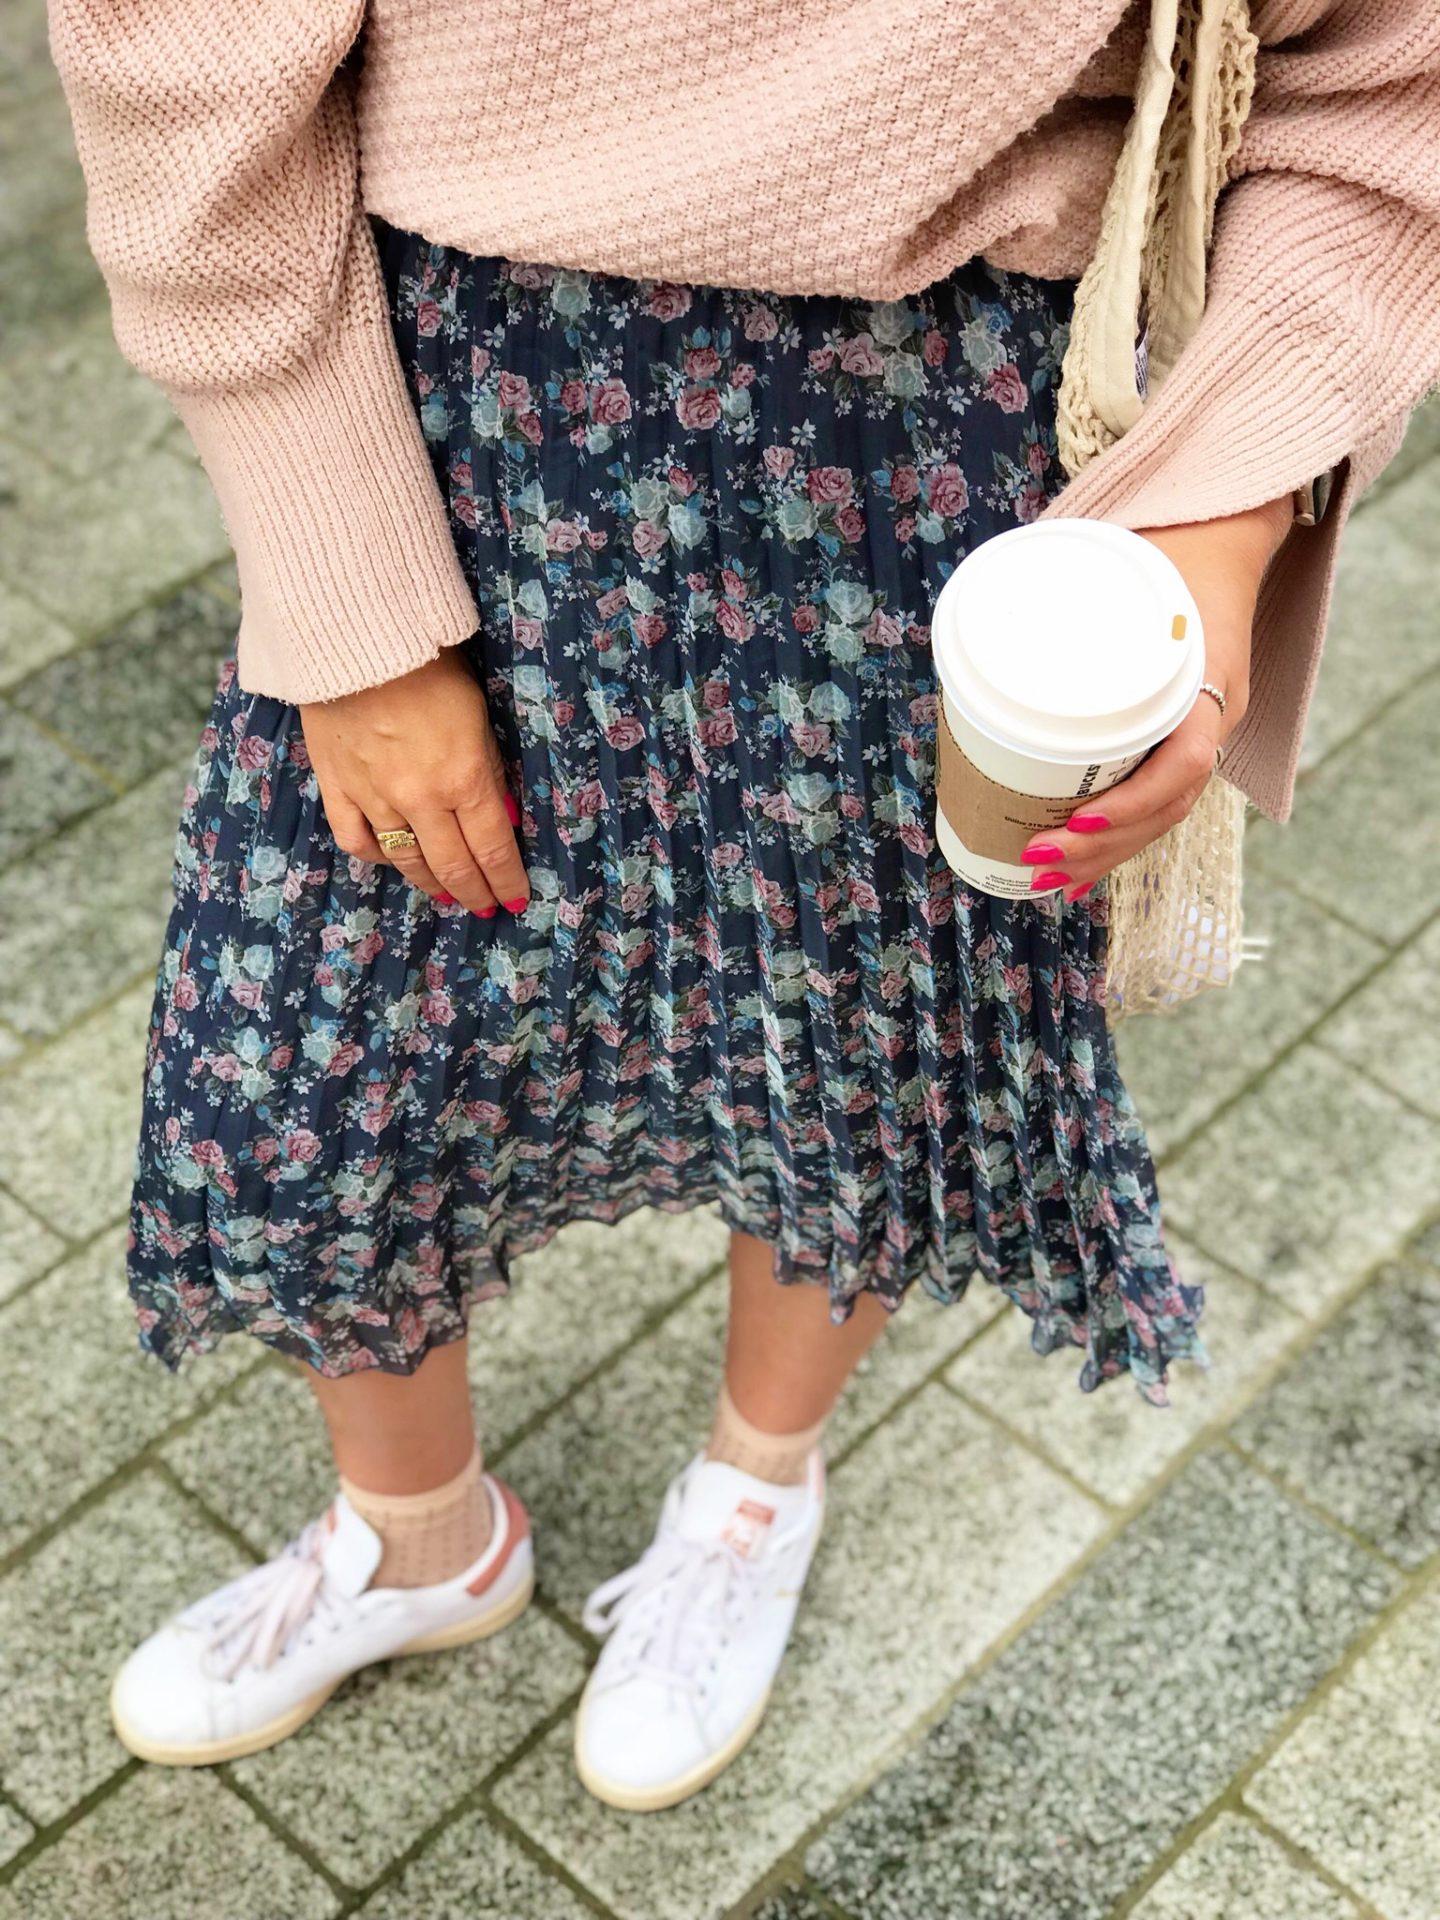 Falling in love with my Autumn wardrobe {Wardrobe Edit}...